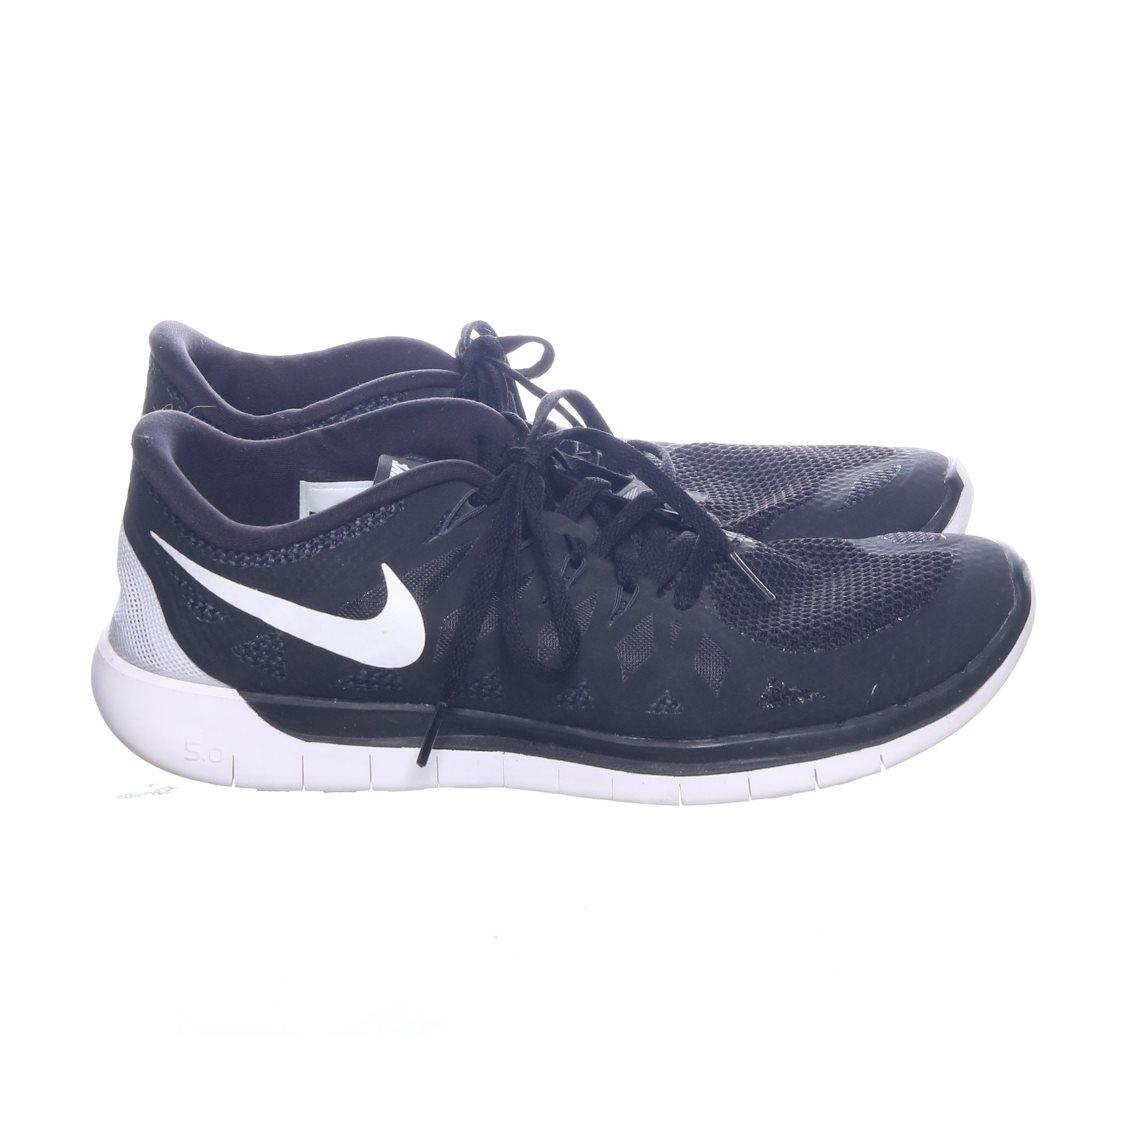 info for 4bb07 bc4dd Nike Free, Löparskor, Strl  42.5, 642198-001, Svart Vit